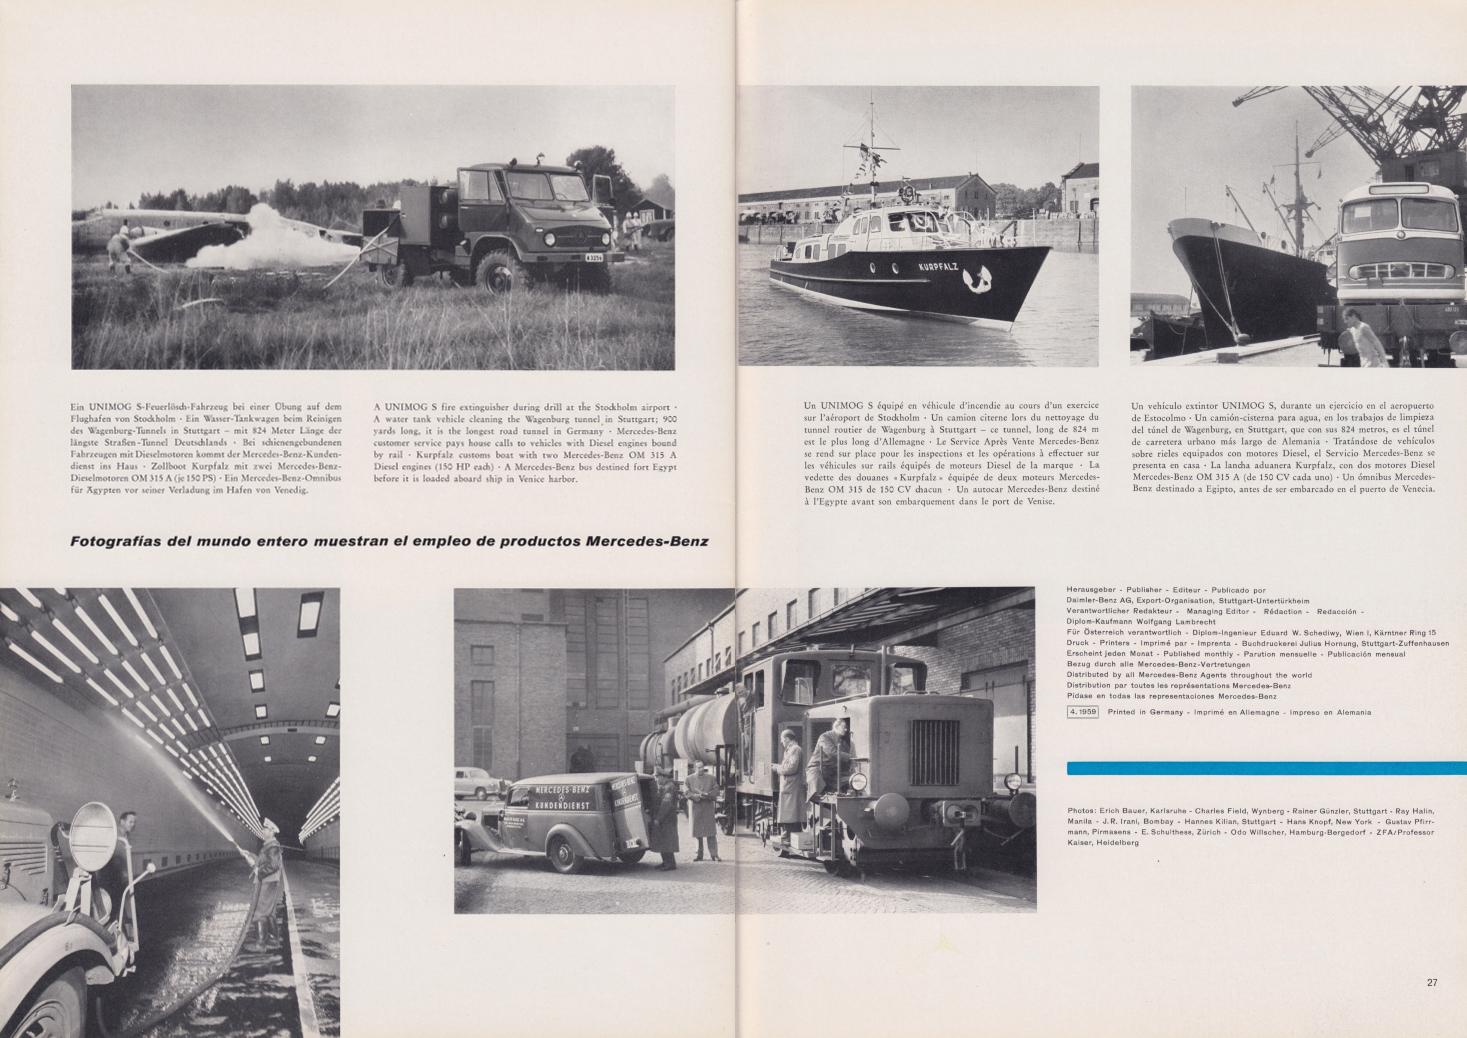 (REVISTA): Periódico In aller welt n.º 31 - Mercedes-Benz no mundo - 1959 - multilingue 014